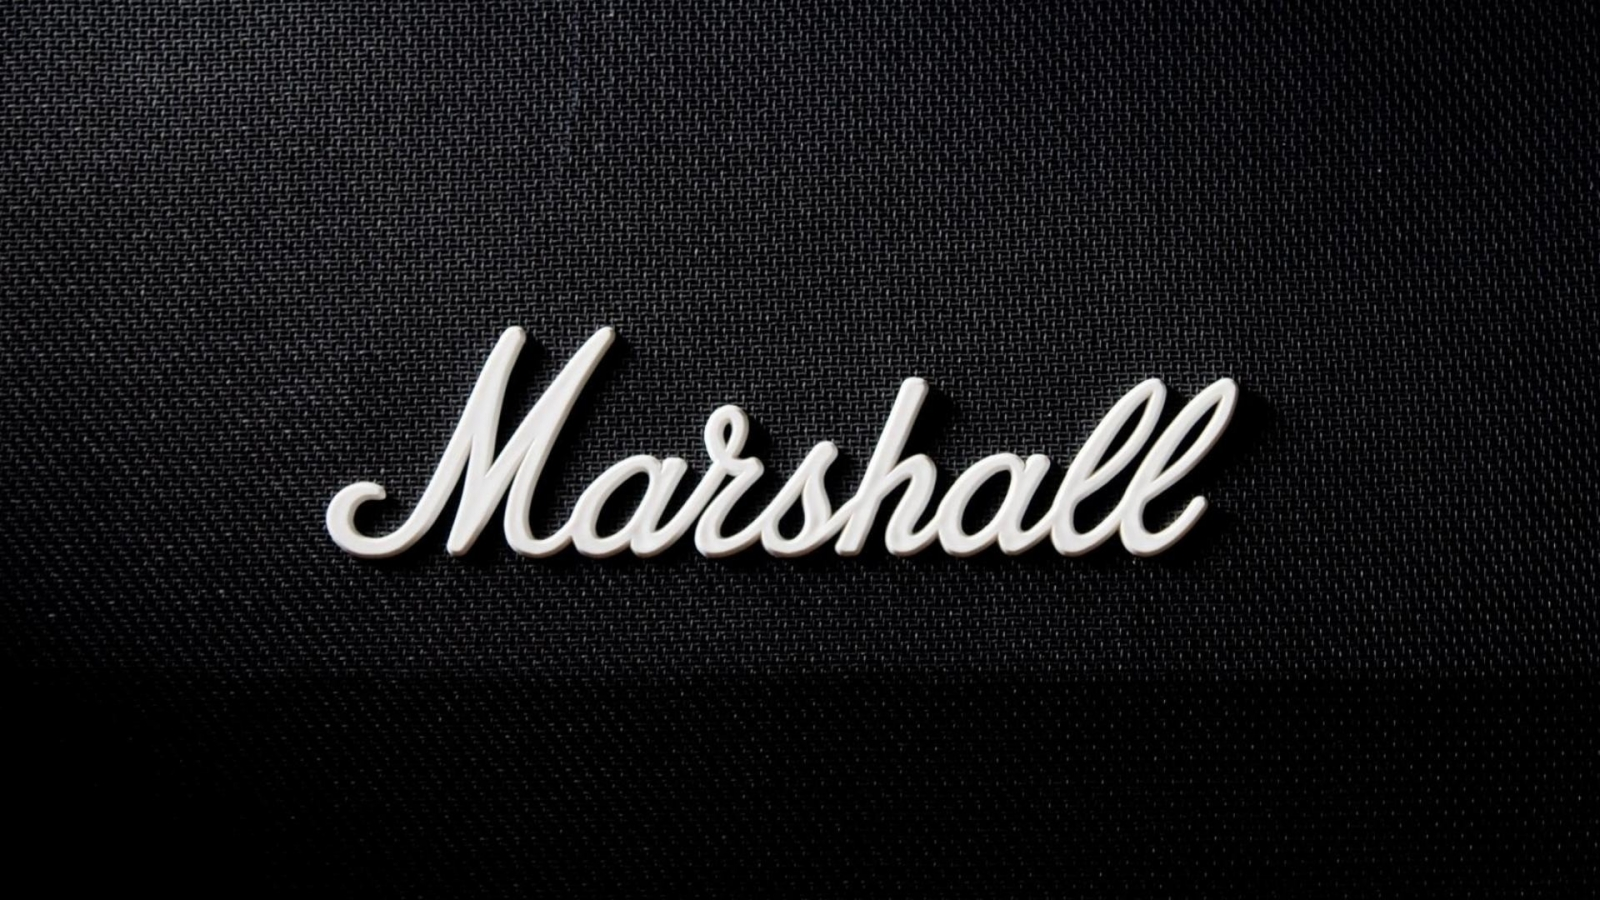 Marshall - 1600x900